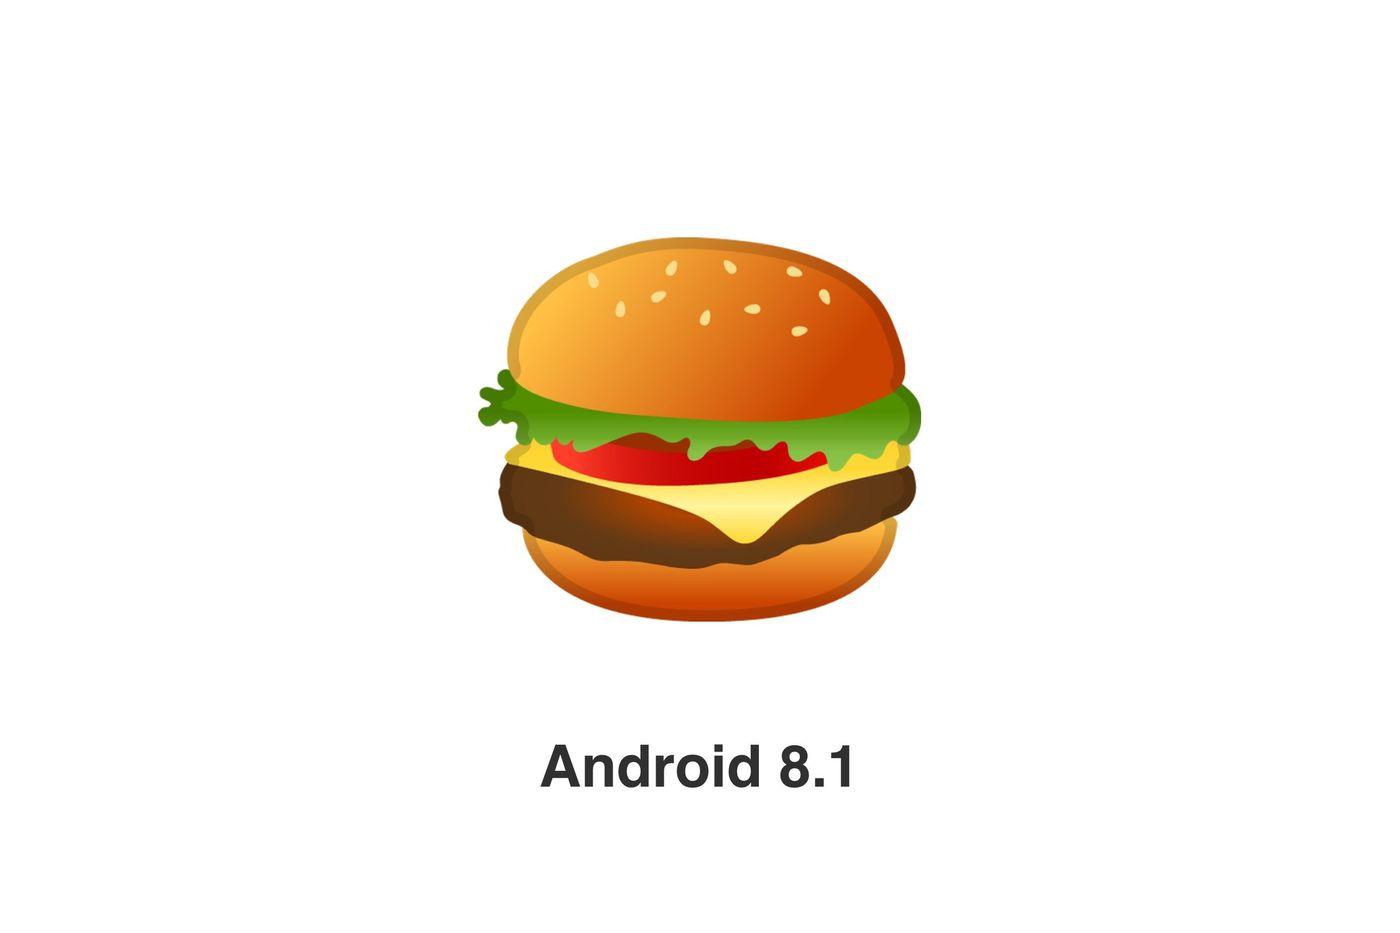 Apple Vs Google: у батлі за дизайн емодзі бургера виграла Apple